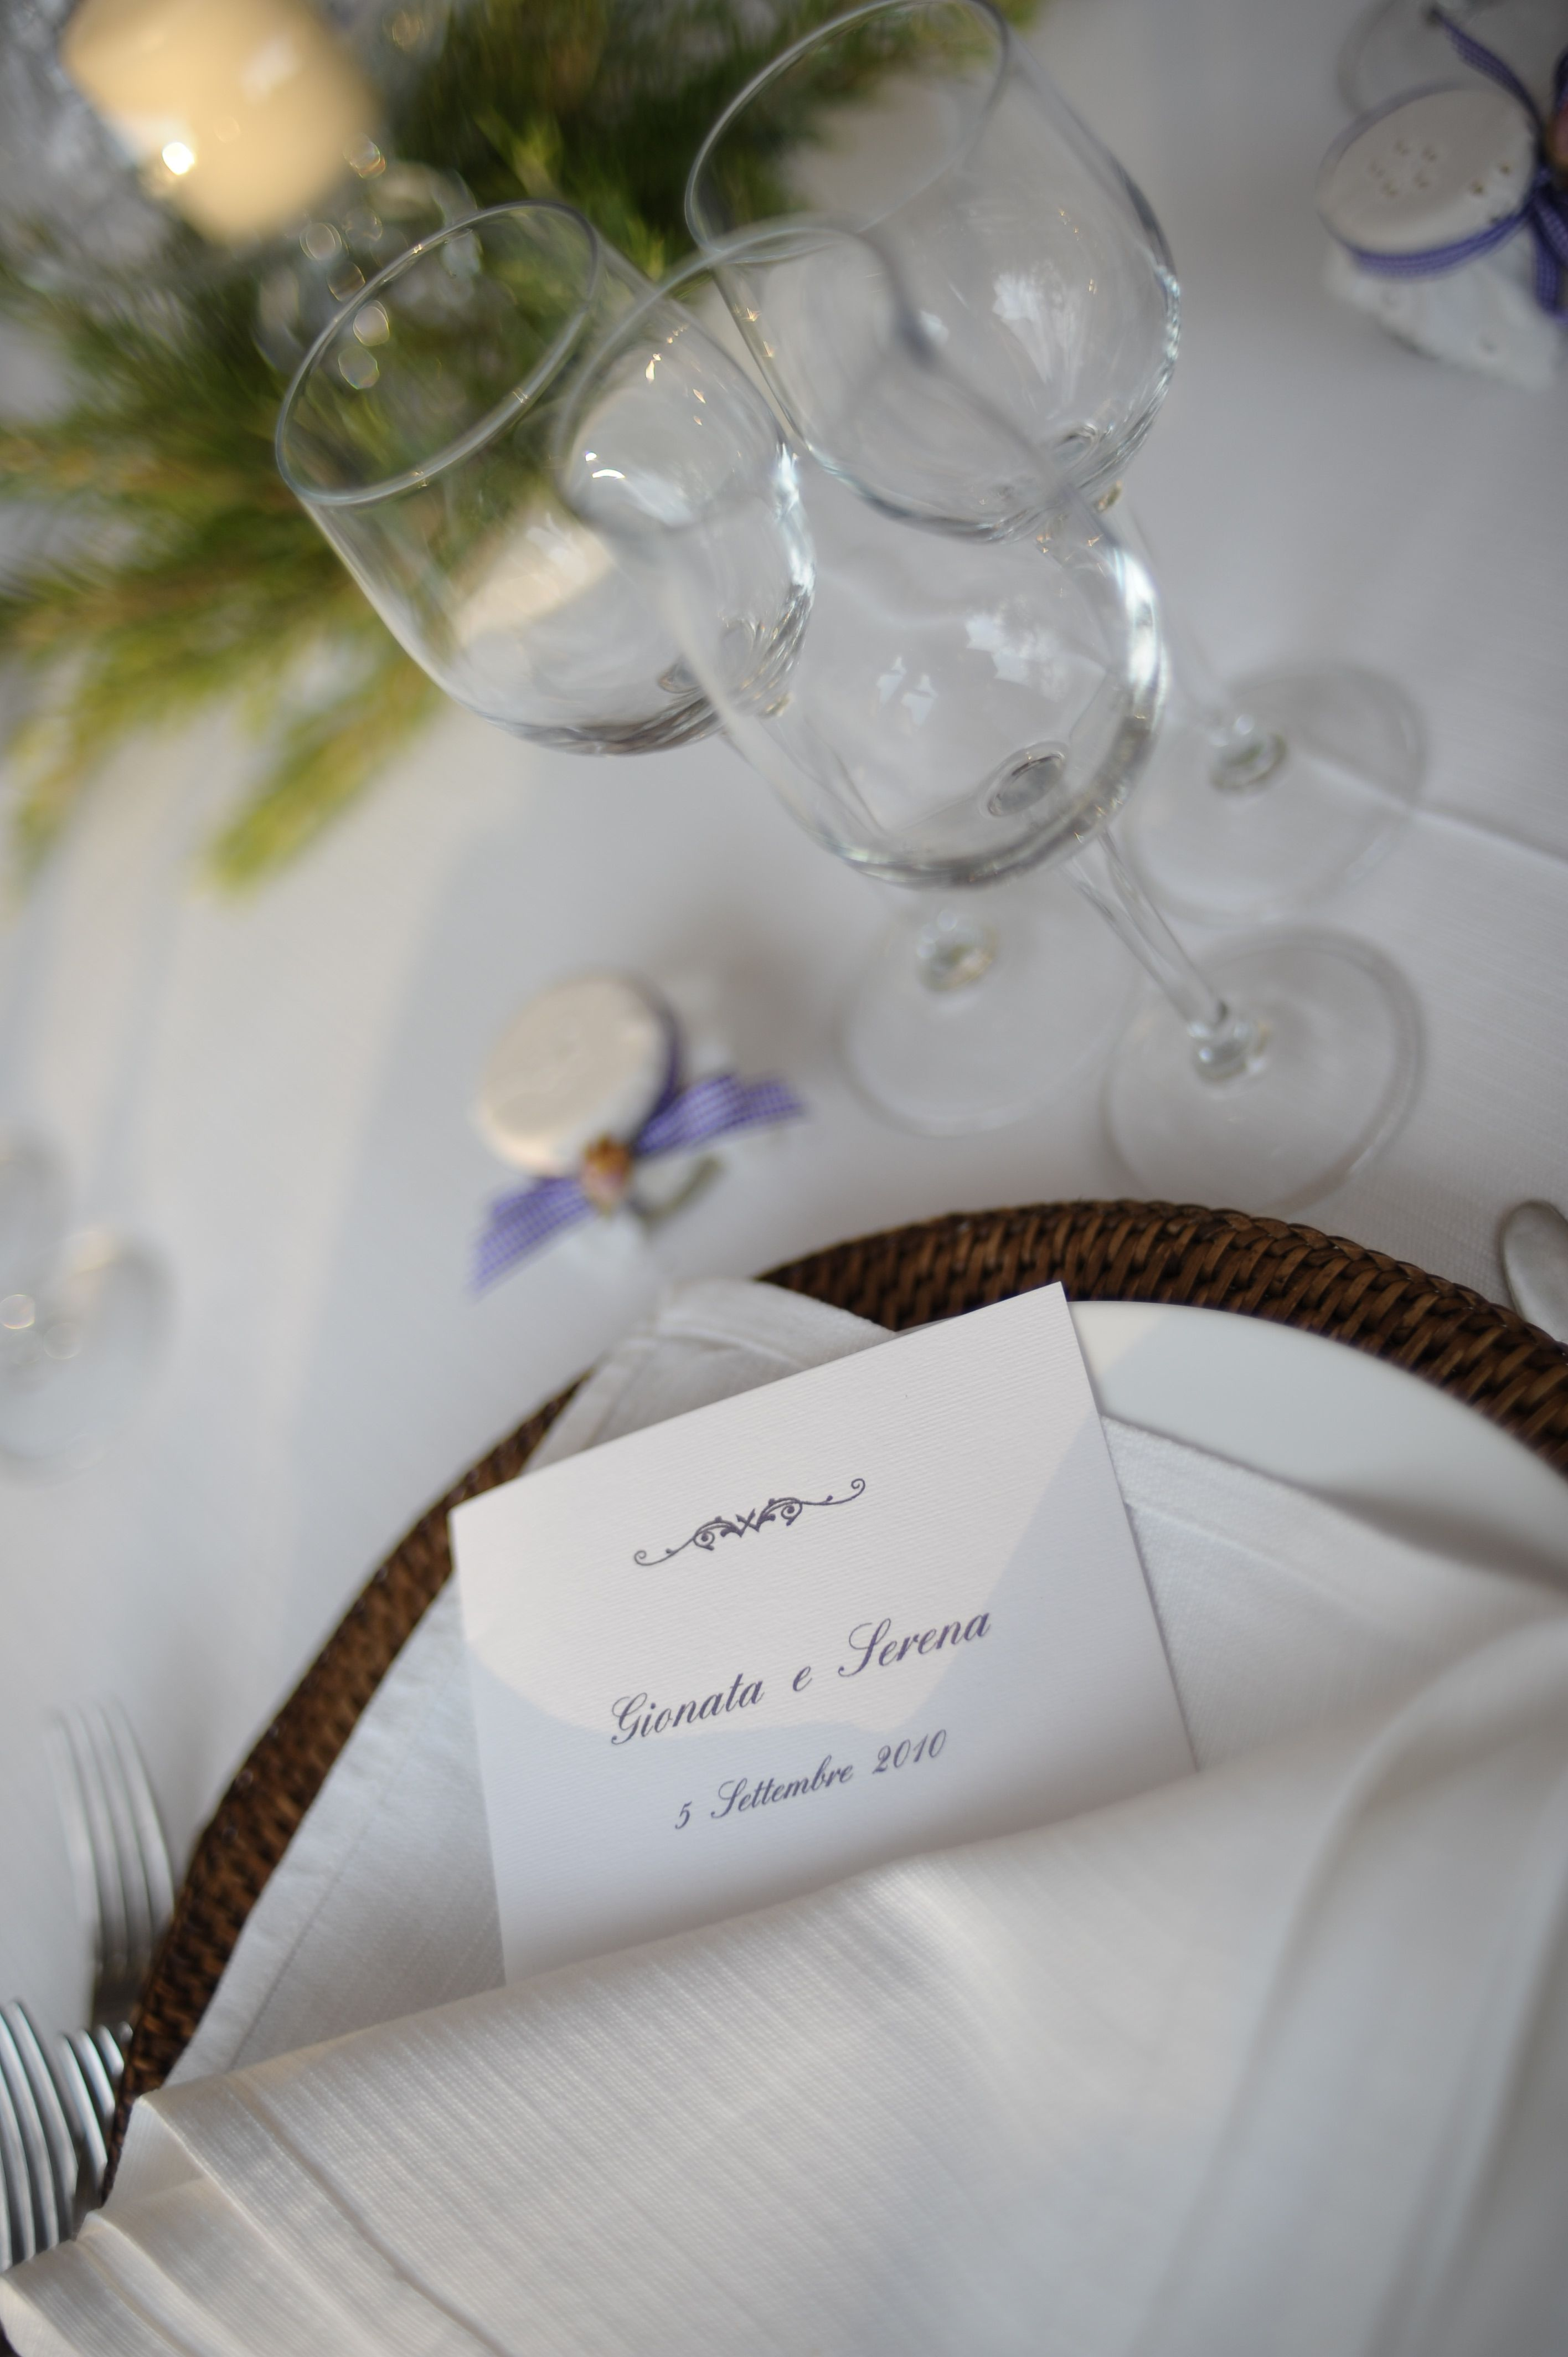 Le Cerimonie di Angela Bartolini wedding in Tuscany